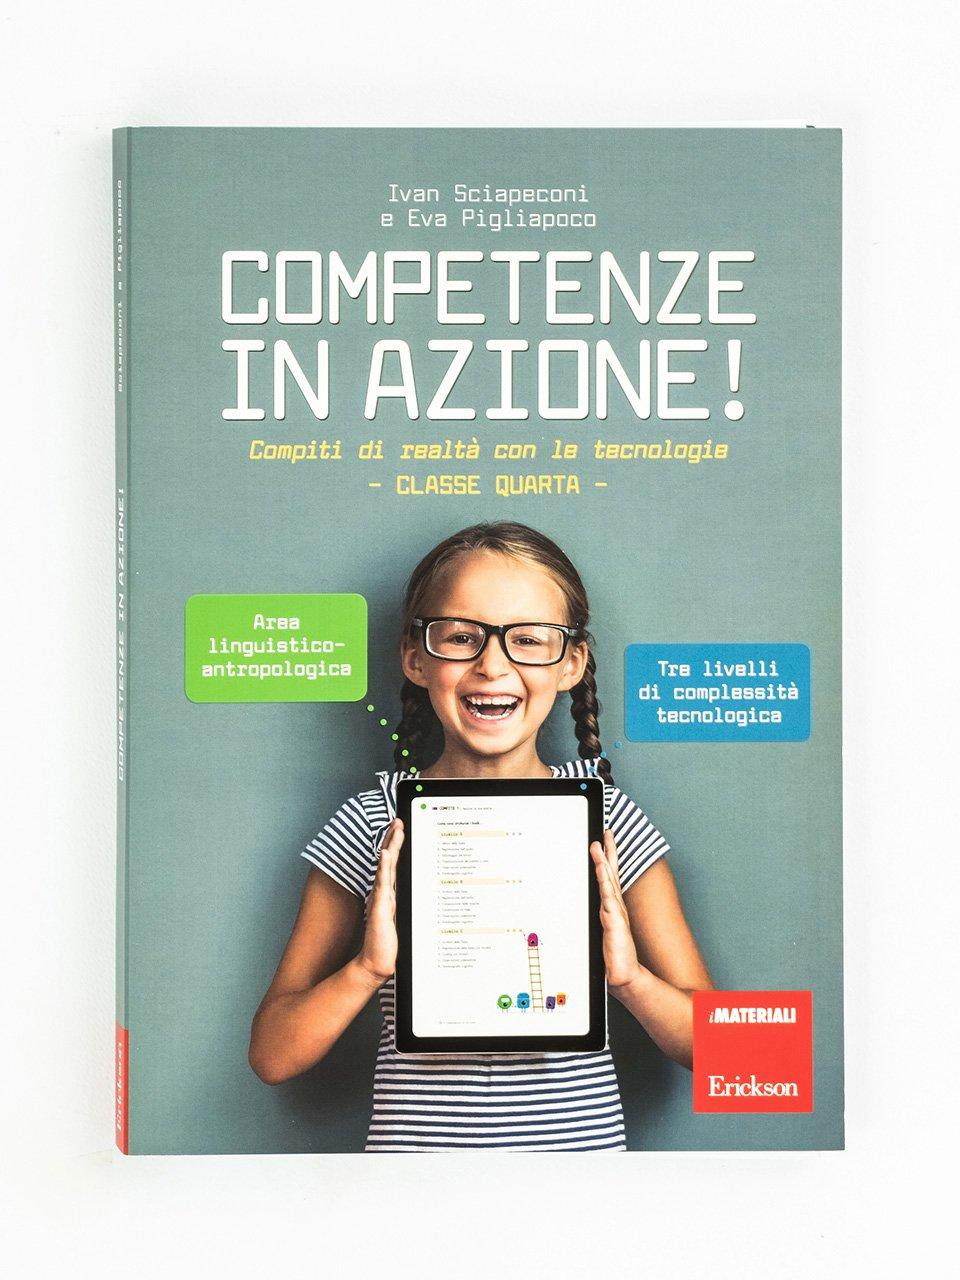 Competenze in azione! - Classe quarta - Area lingu - Libri - Erickson